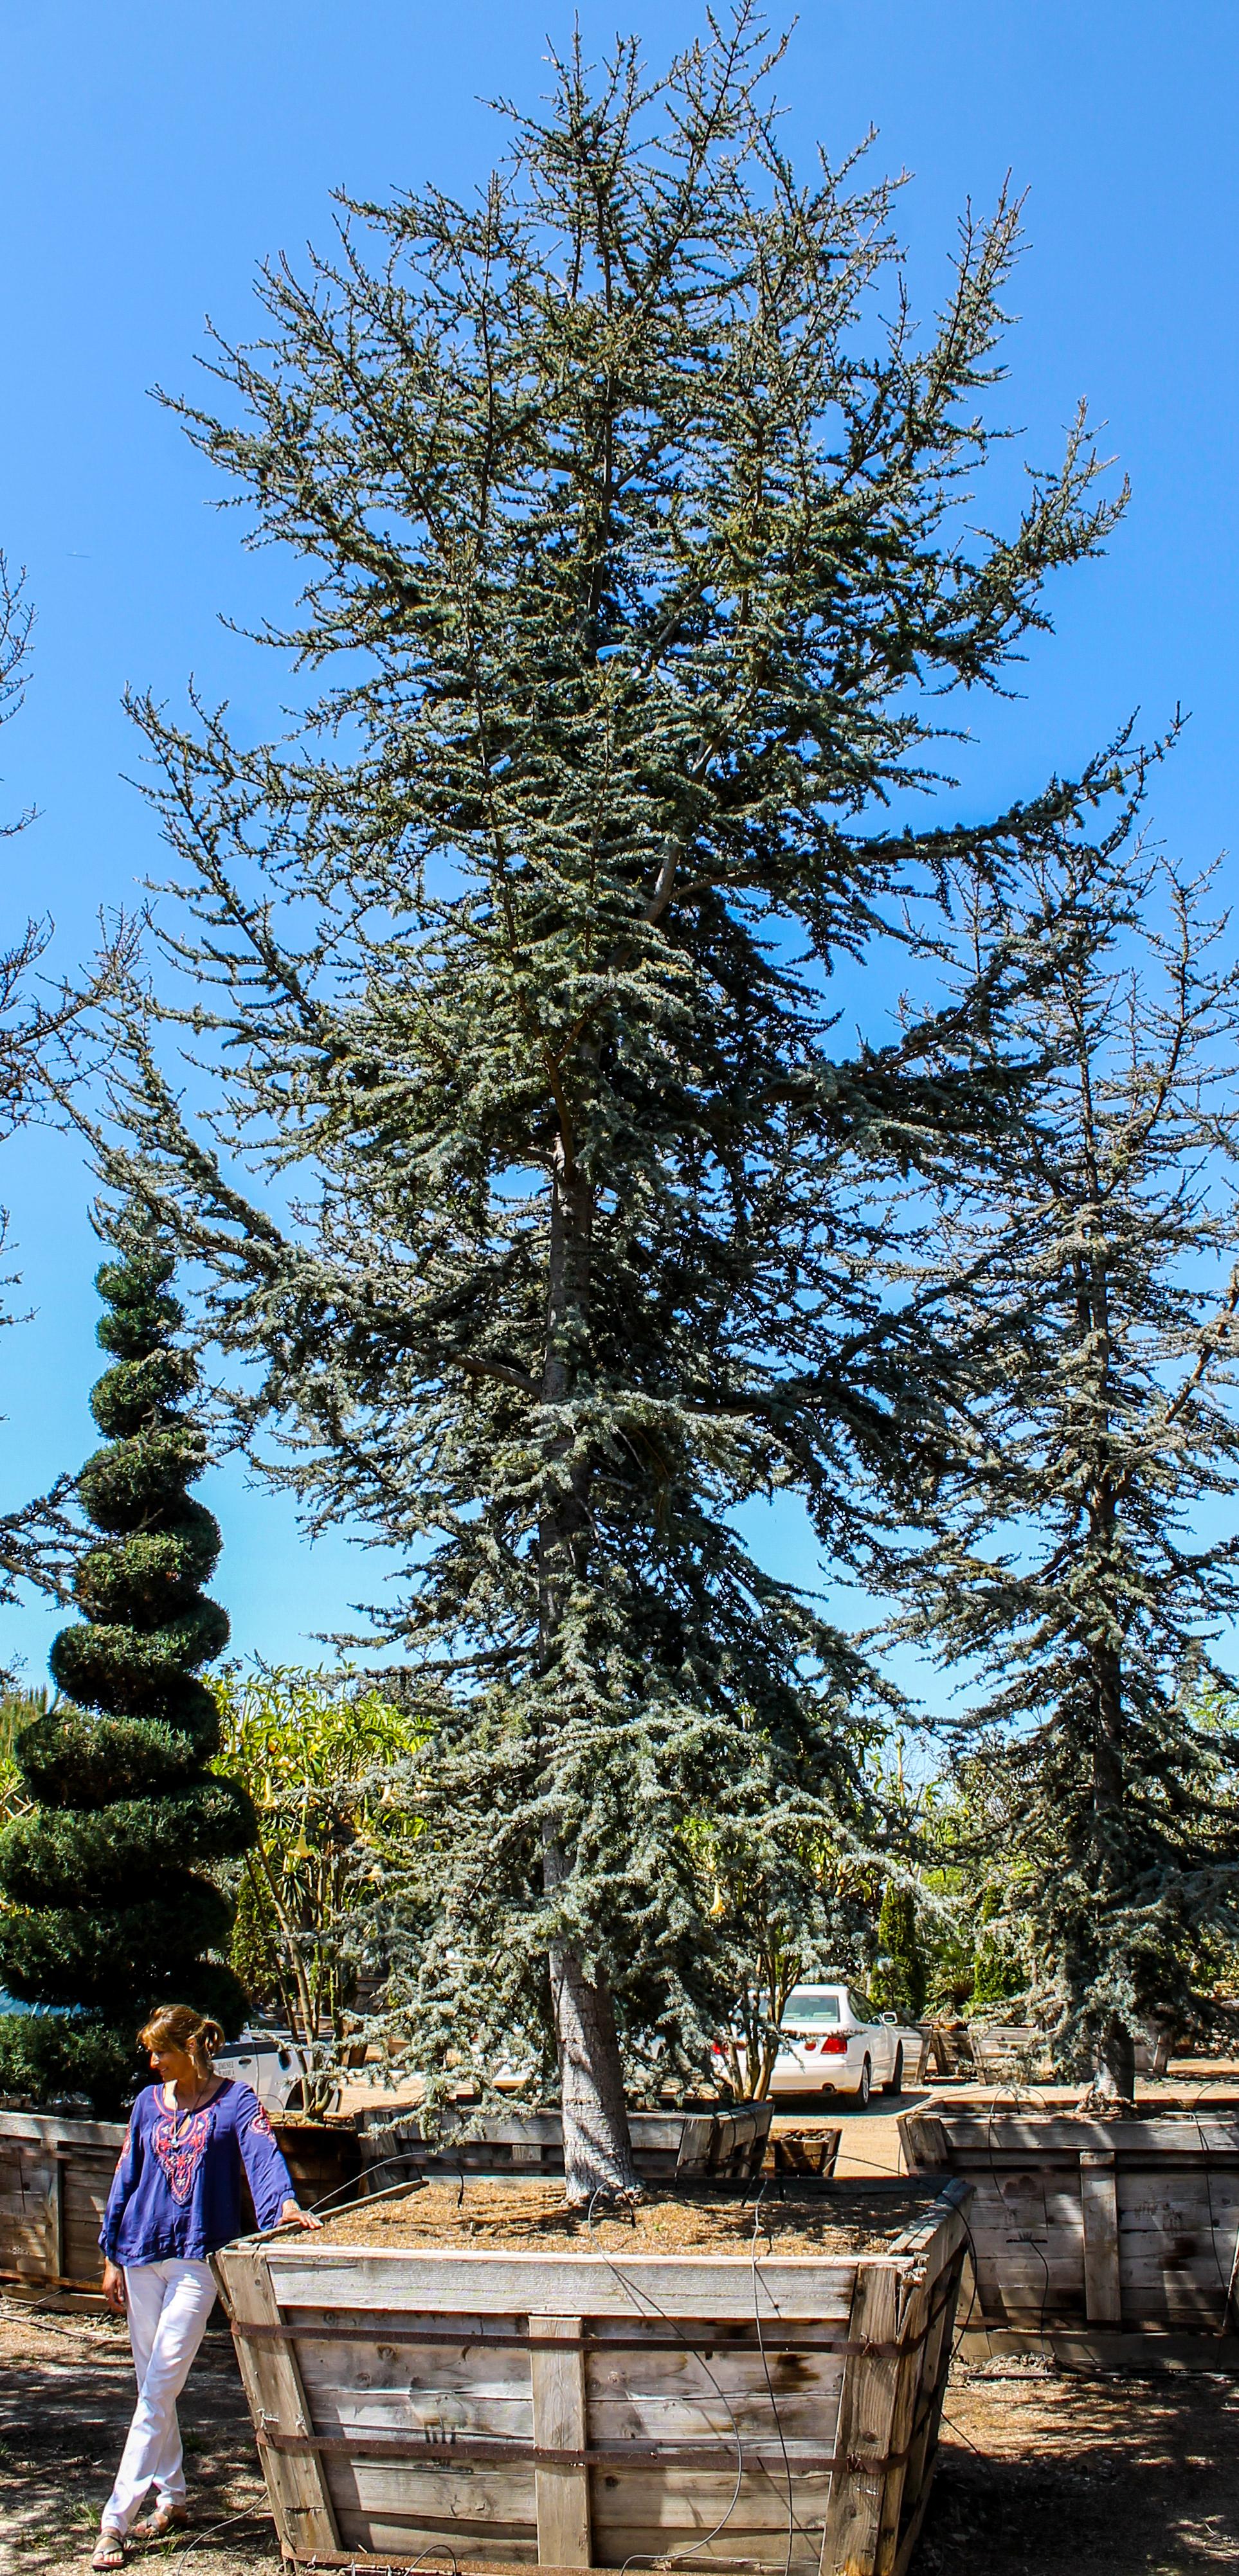 Cedar atlantica Glauca 72 box - 26 ft x 11 ft (2 units) (2).jpg